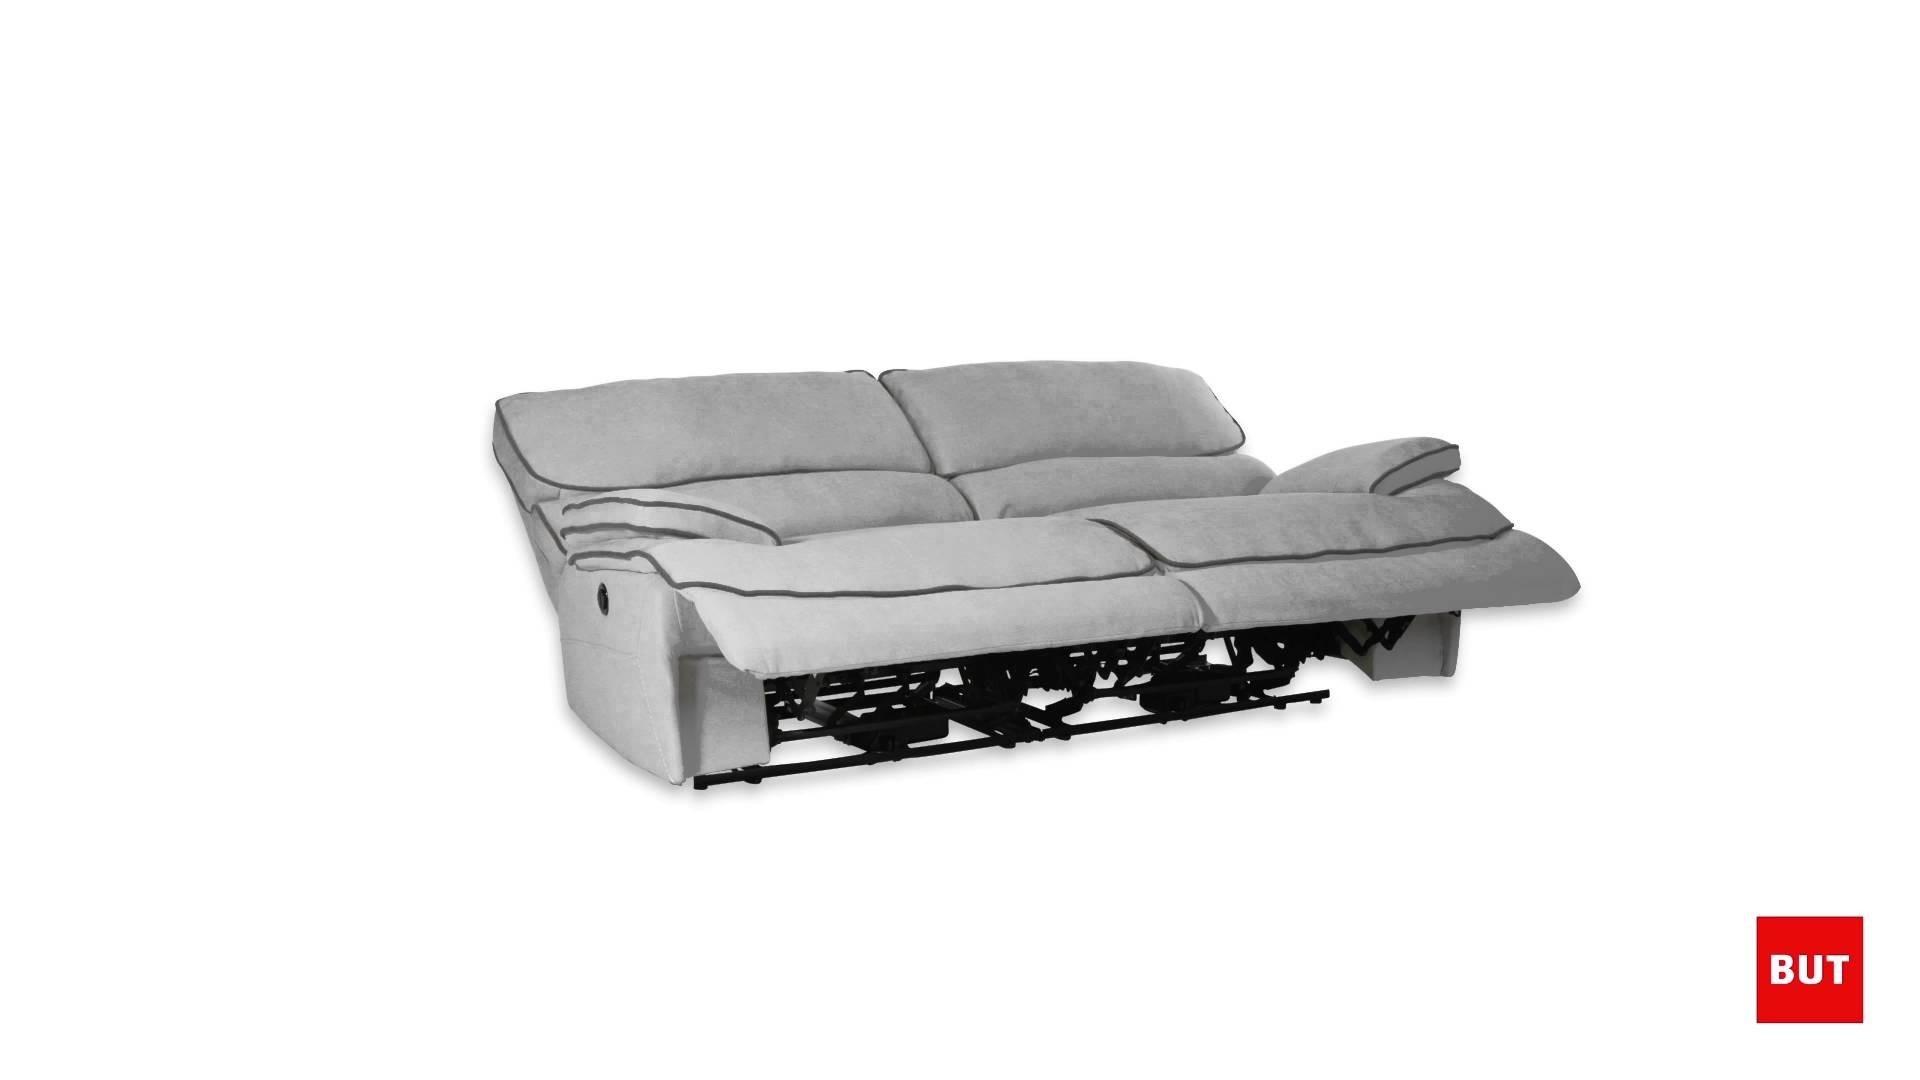 Ikea Canapé Angle Convertible Frais Collection Lit Armoire Canapé Beautiful Canap En U Convertible 12 Full Canape D